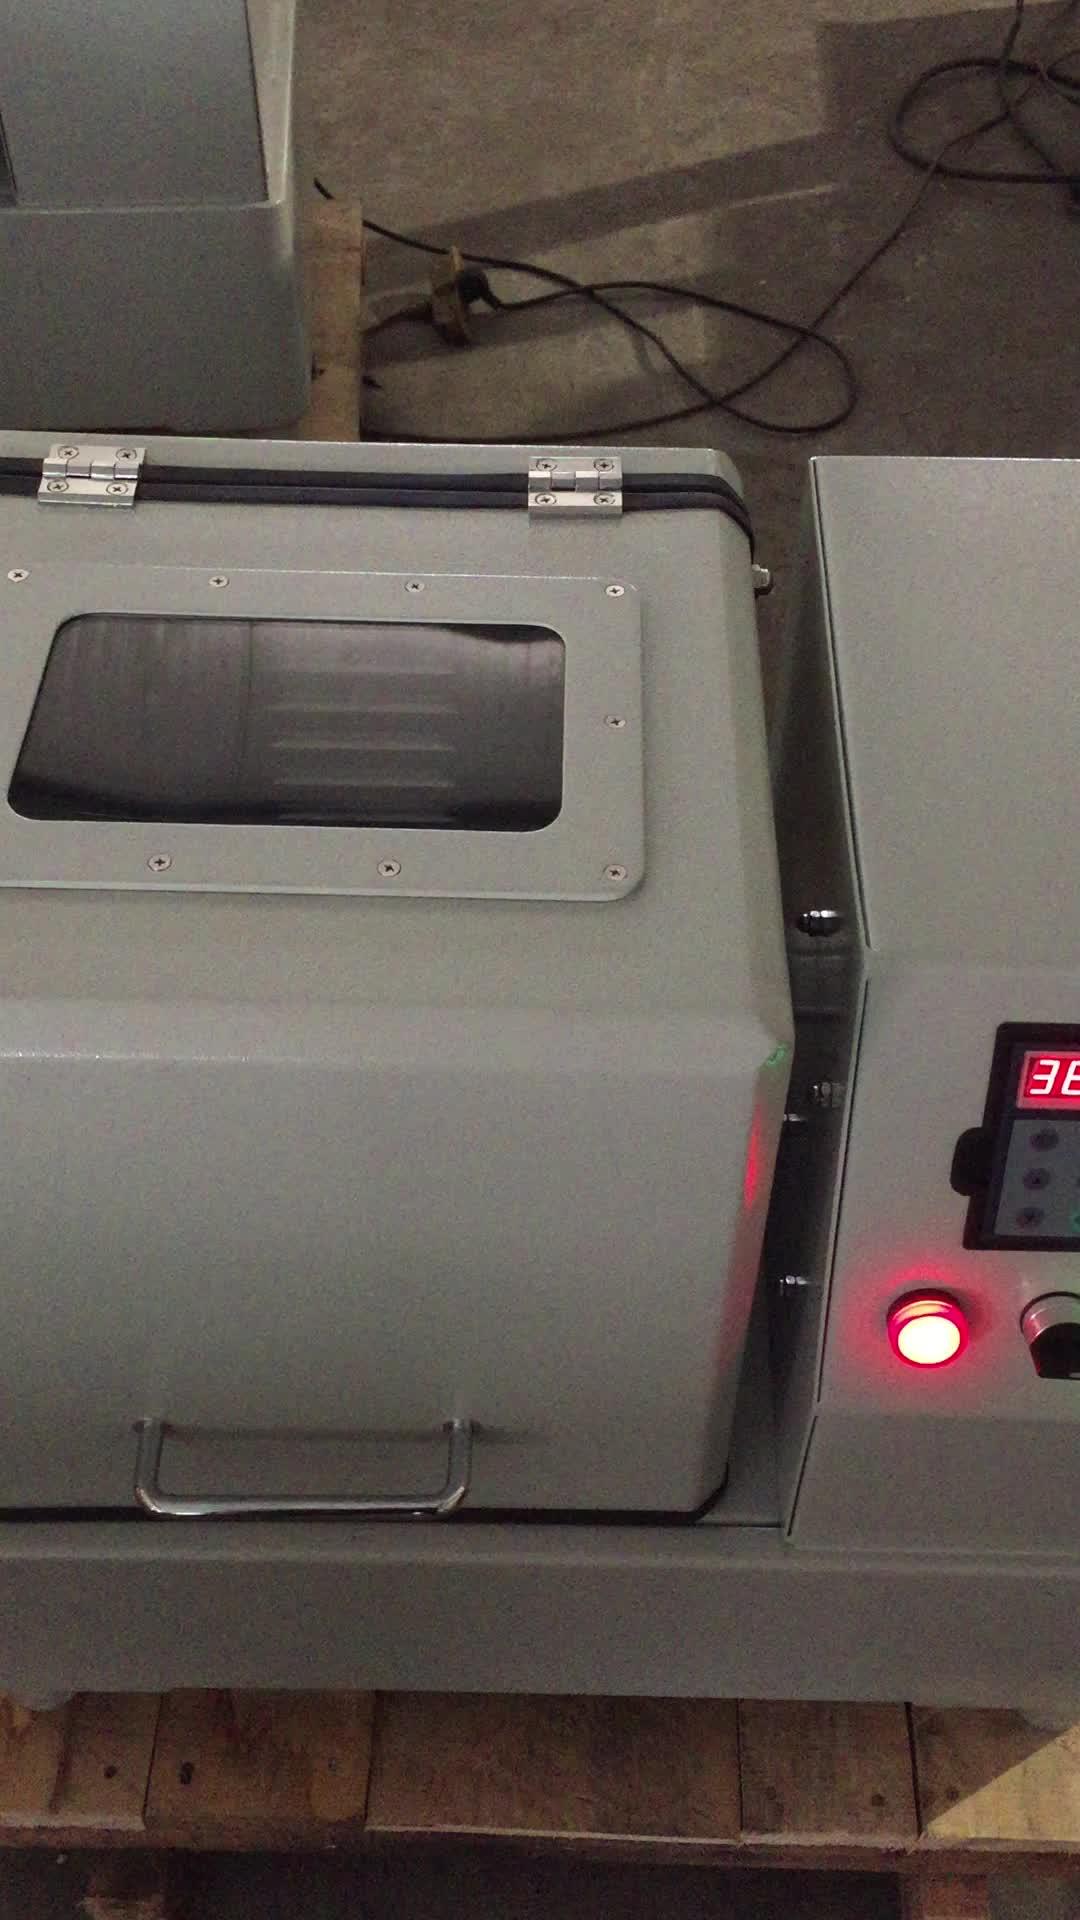 Nanopulver-Planeten-Kugelmühle 0,4L, 2L, 4L, 8L, 12L, 20L von Henan Fineschina Machinery